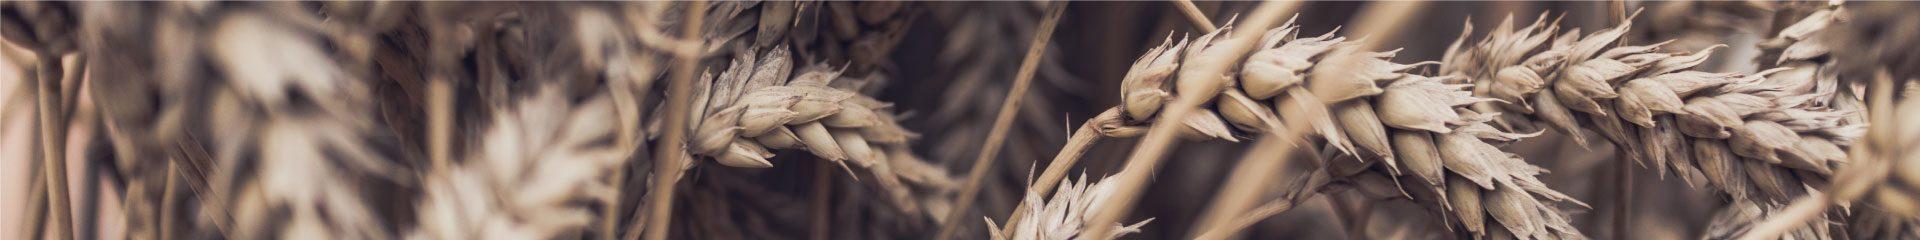 Wheat Bran Series